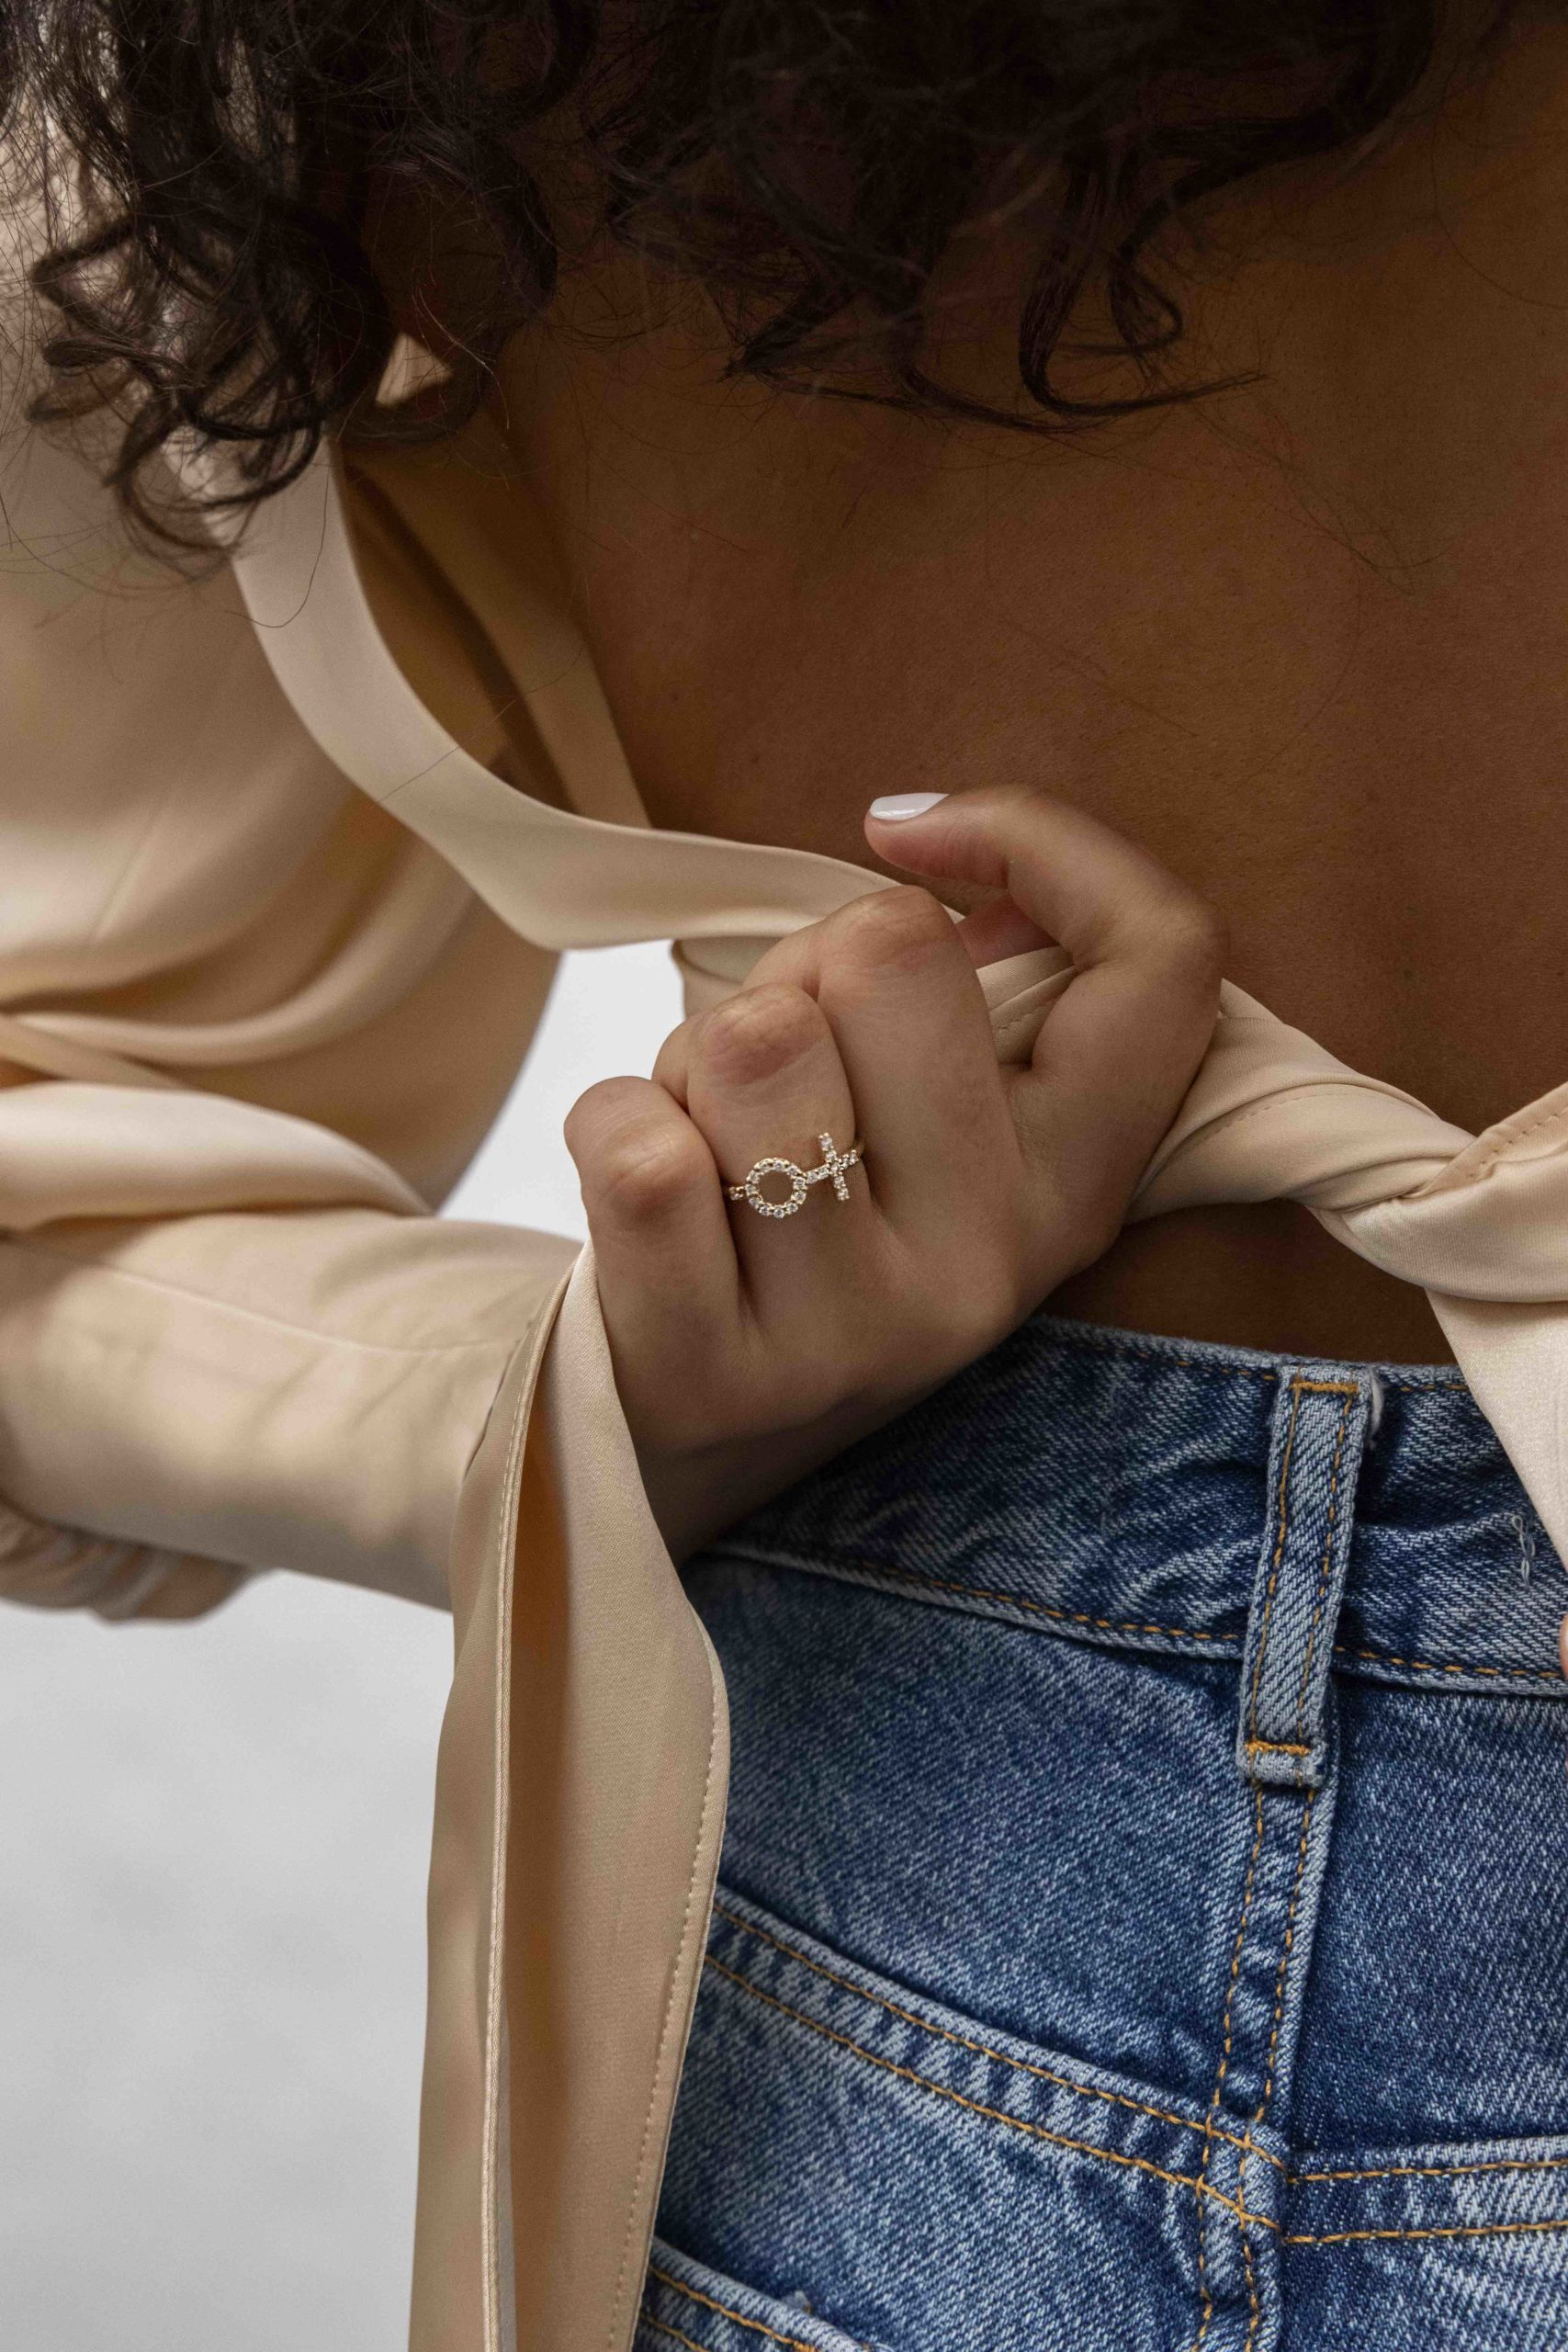 matilde-jewellery-iwd